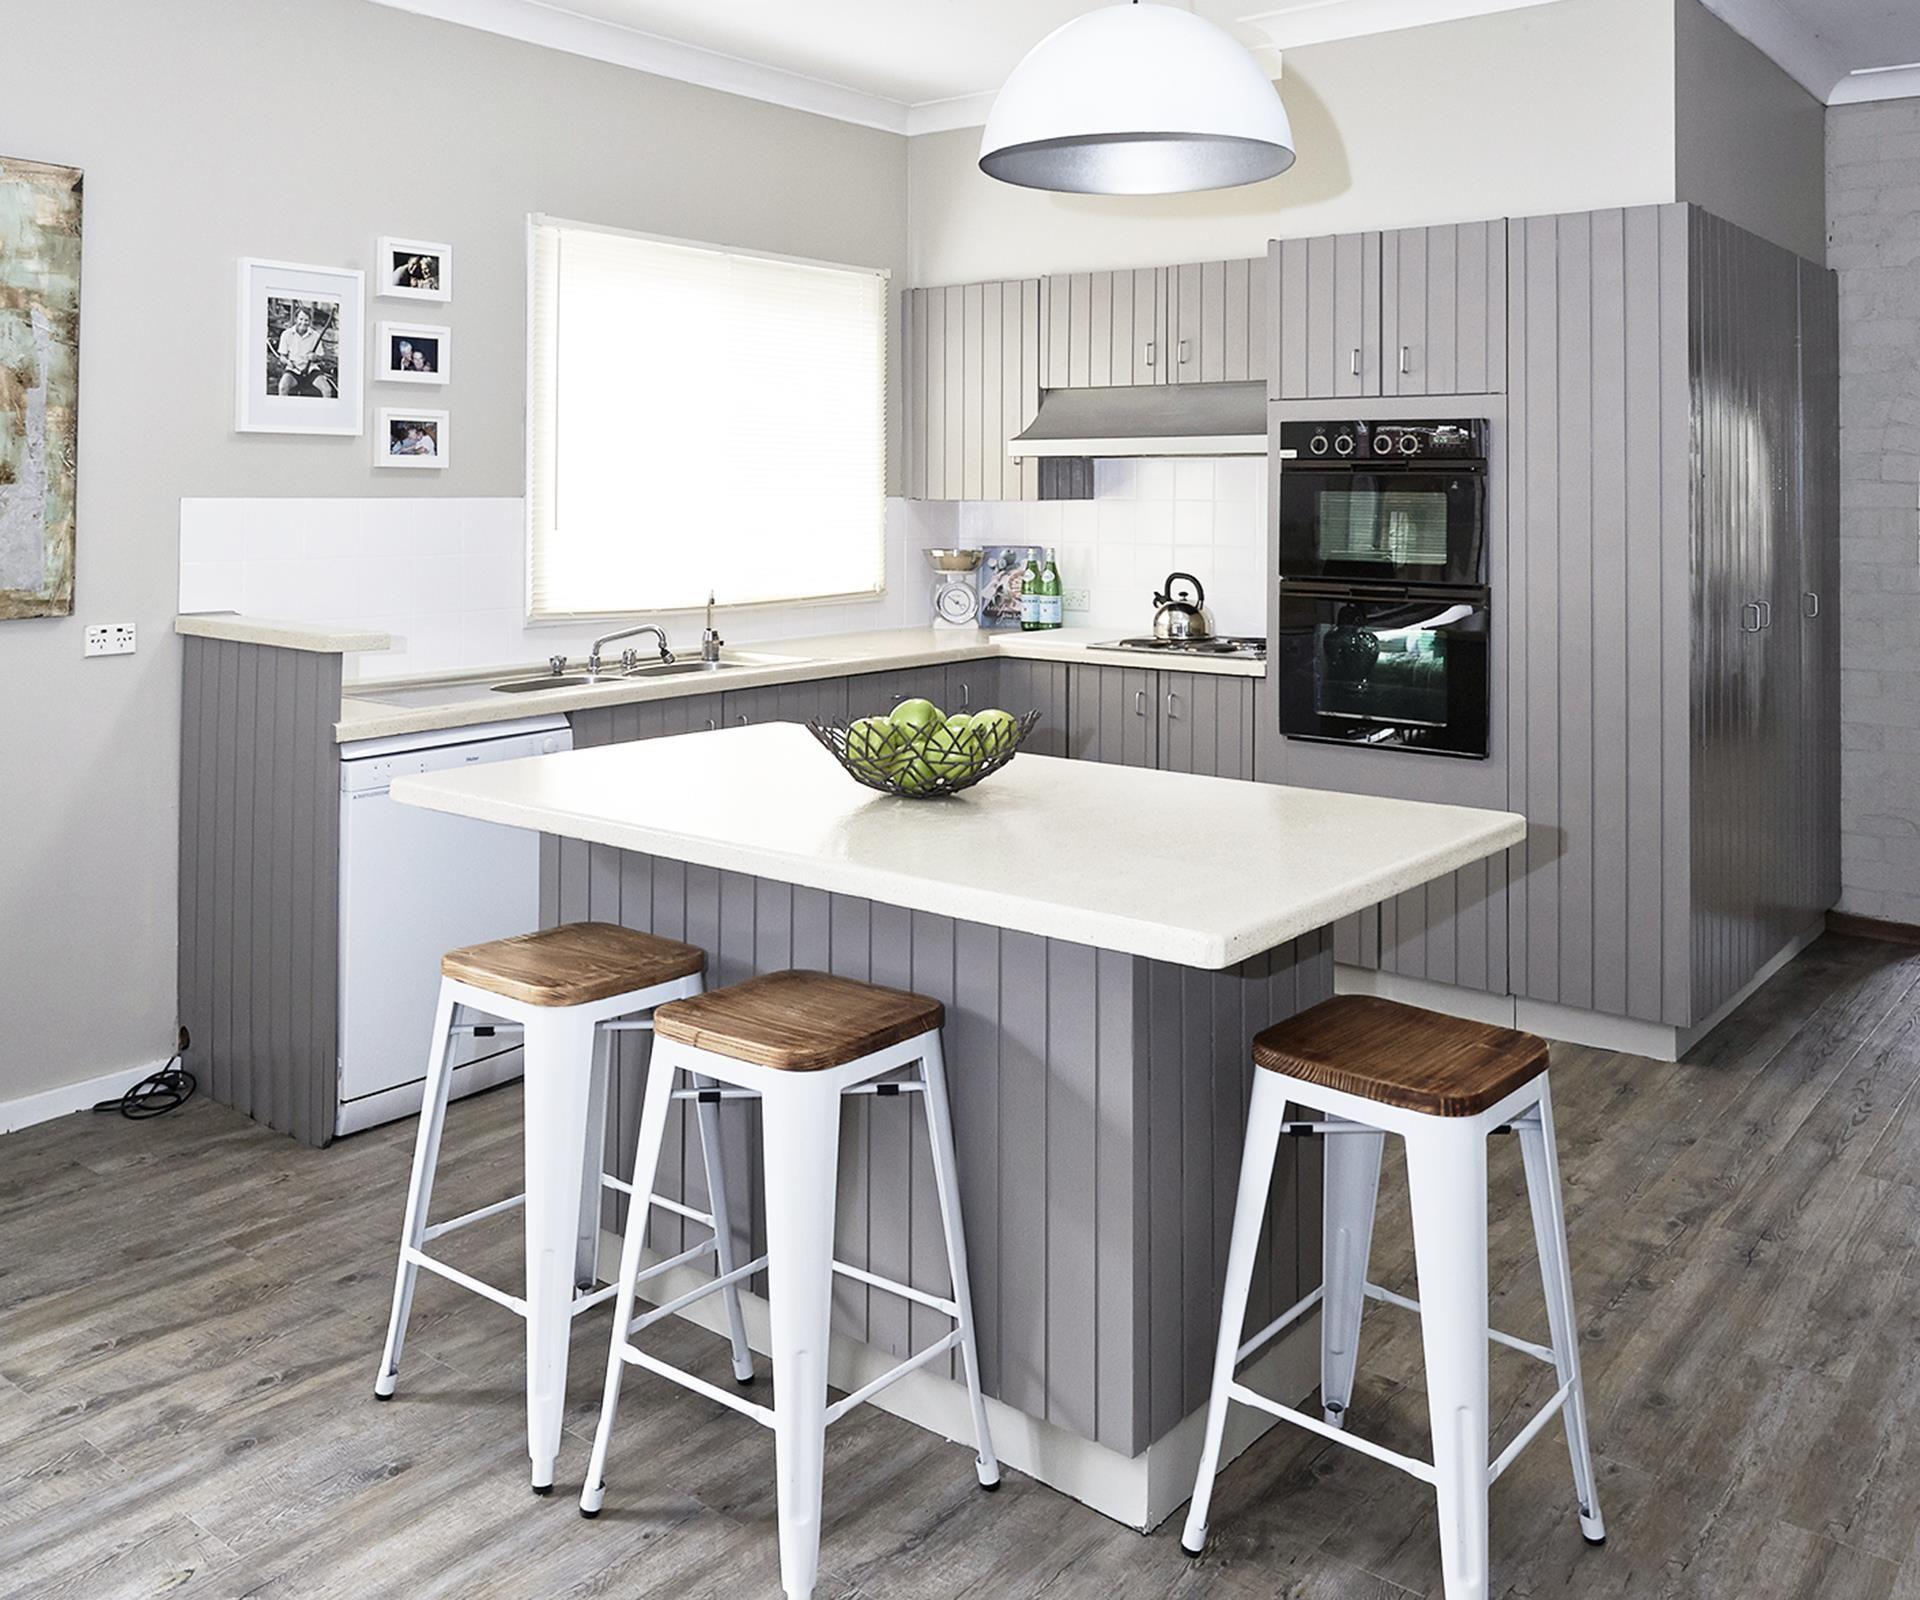 5 secrets of budget kitchen renovations | Remodeling ideas, Kitchens ...